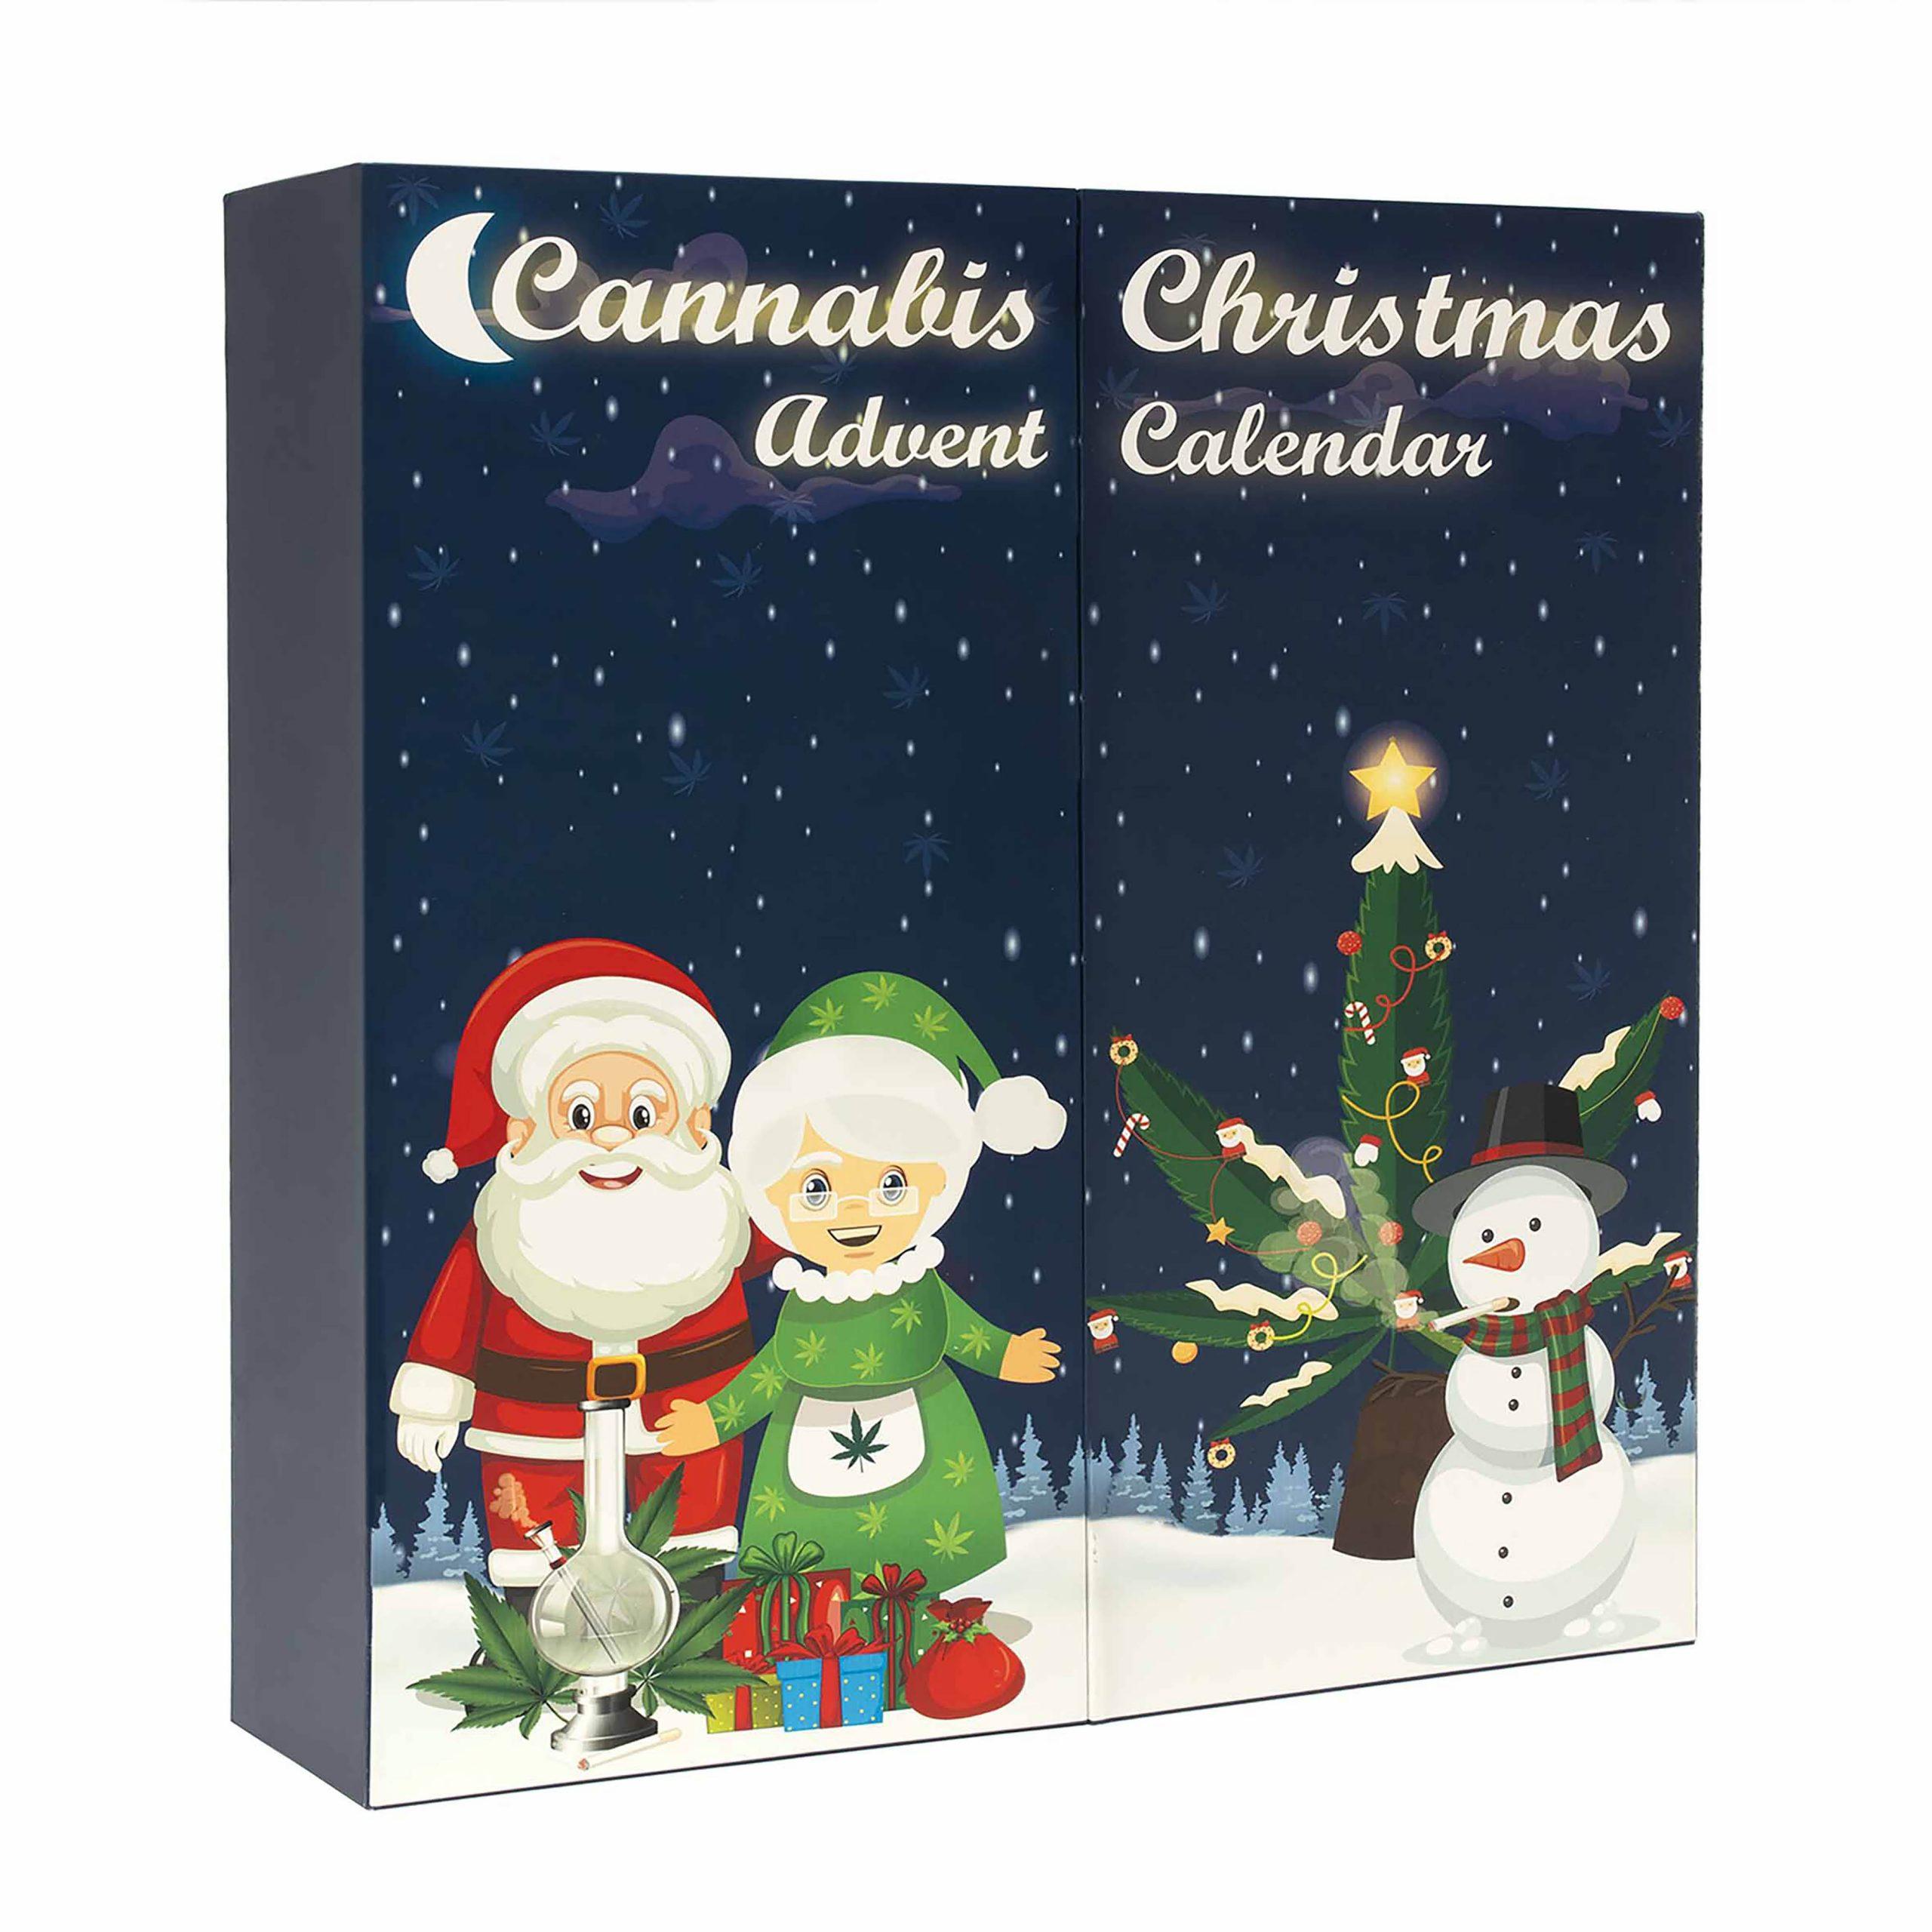 www.cannadish.net